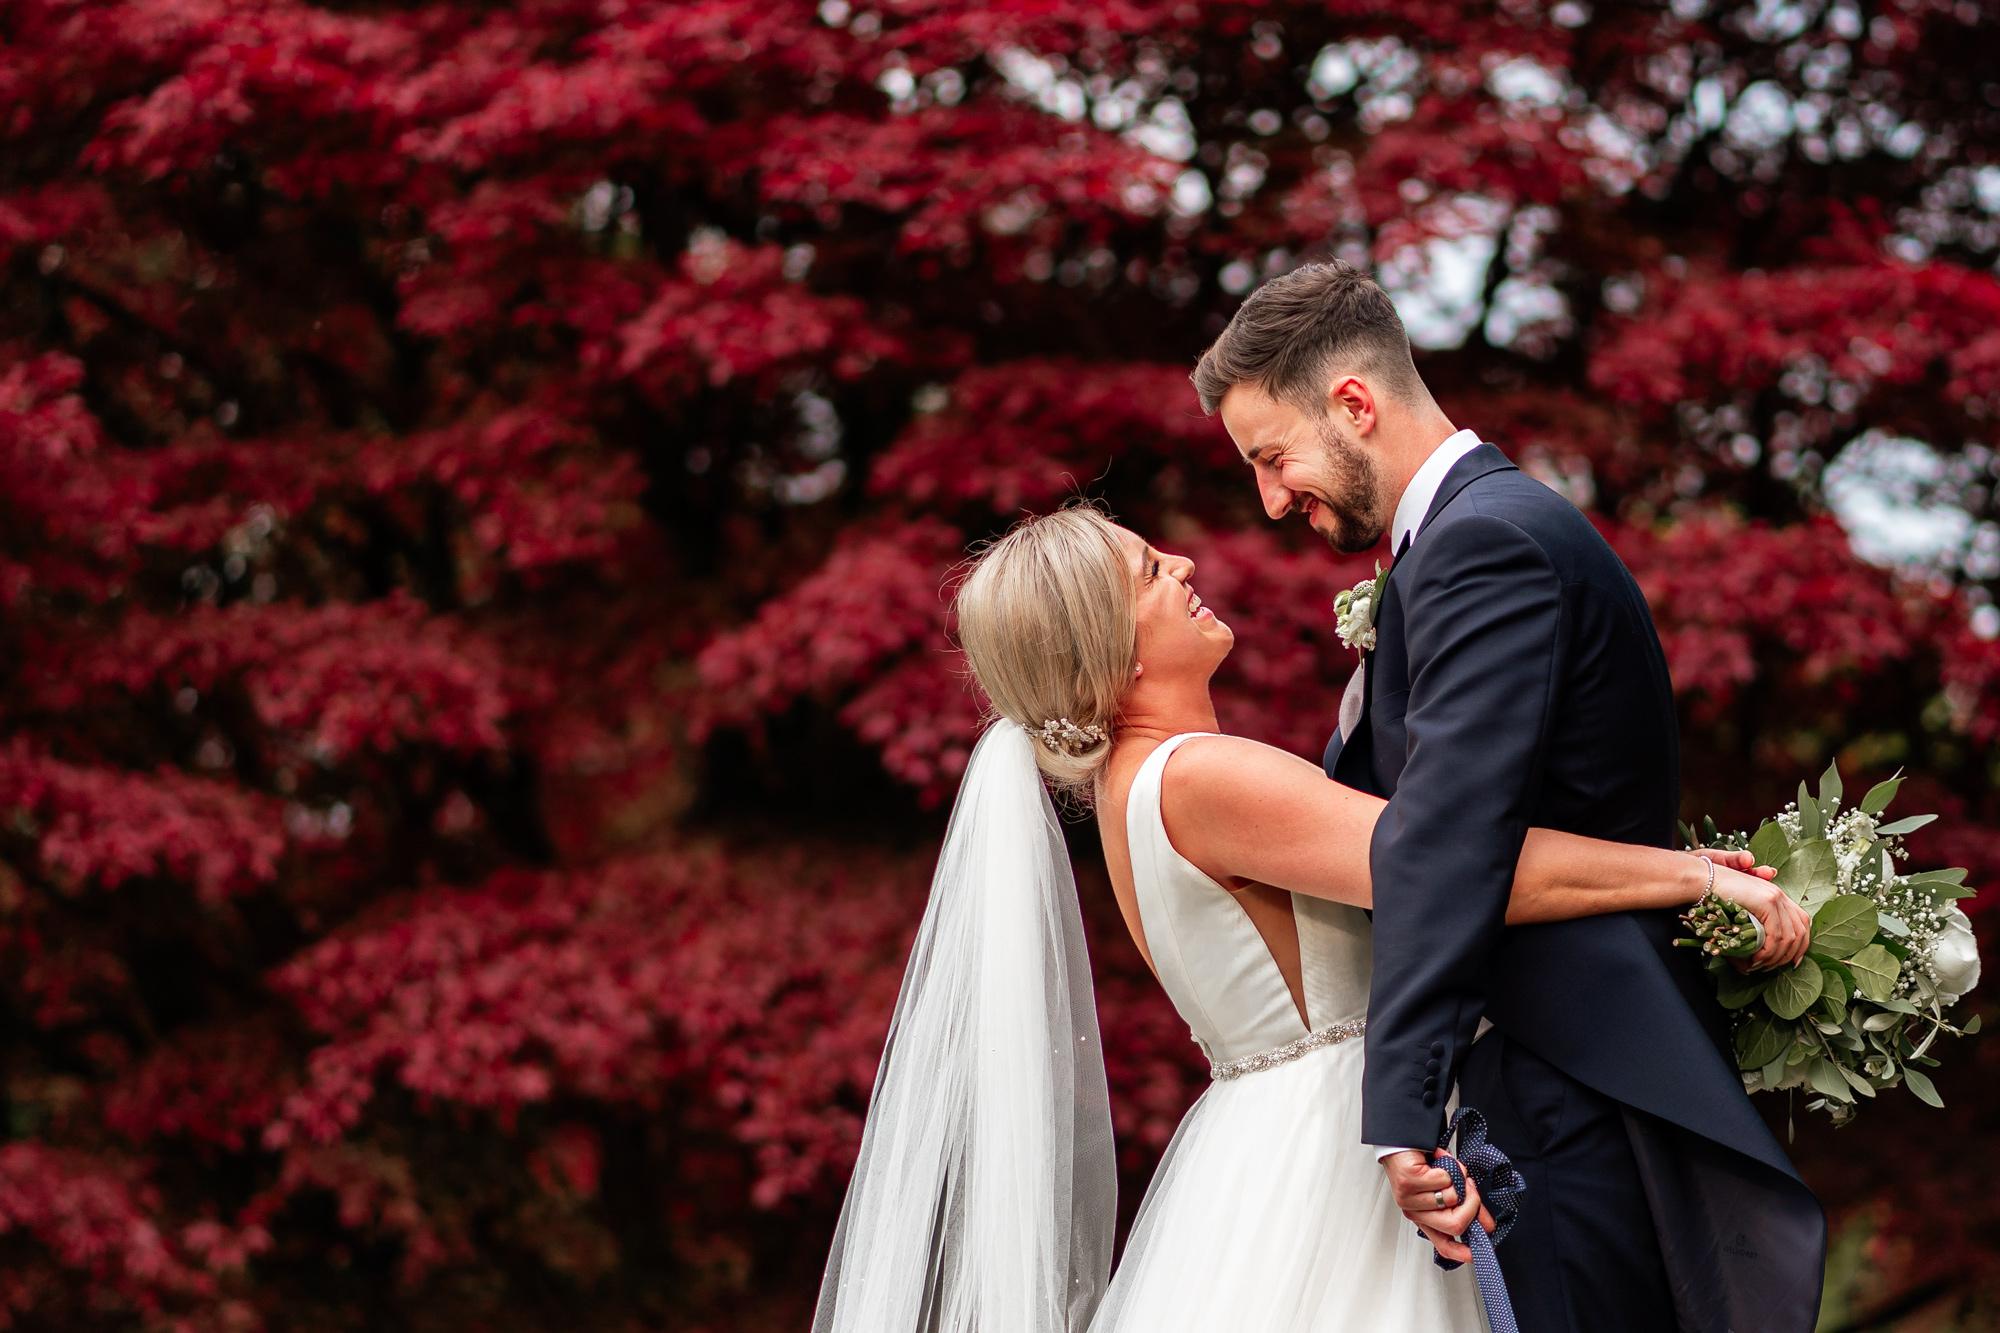 Wedding photographer Eaves Hall